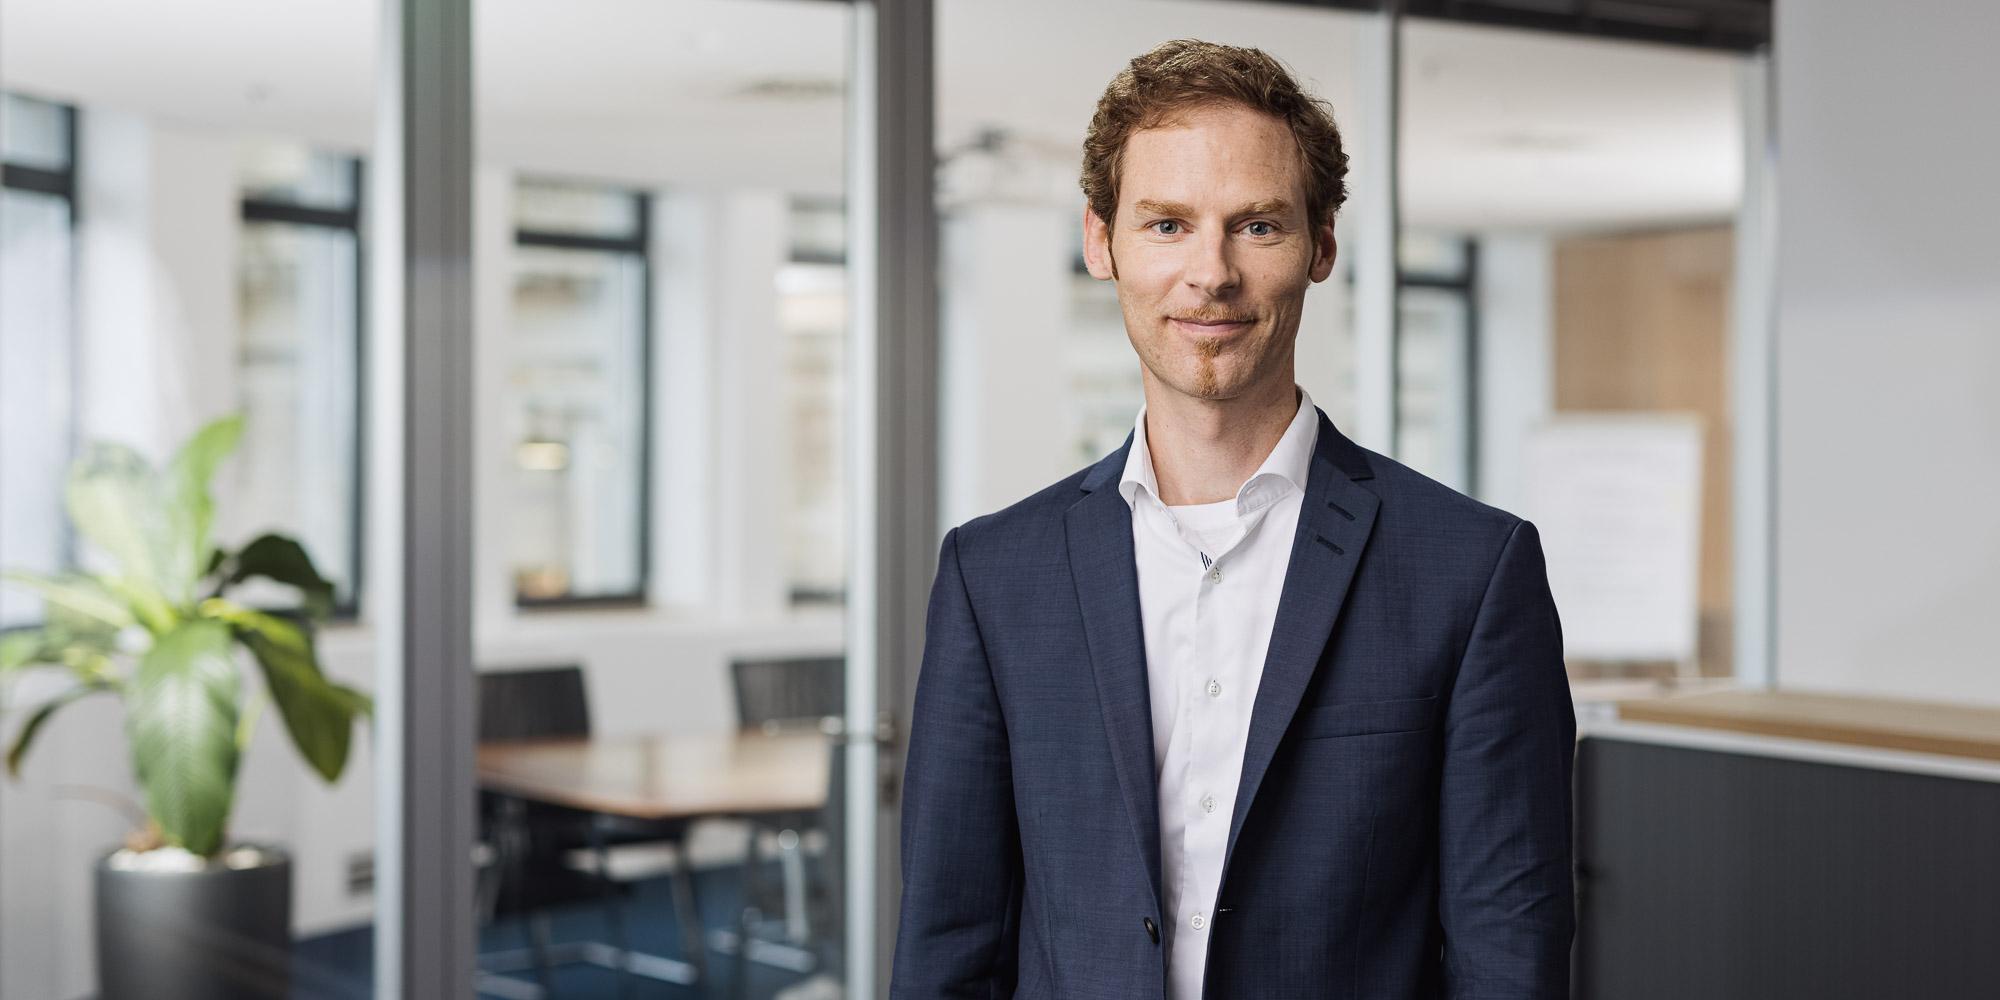 Portrait Ortwin Philipp Partner Rechtsanwalt Mediator Fachanwalt für Verwaltungsrecht Immobilienrecht Umweltrecht Baurecht